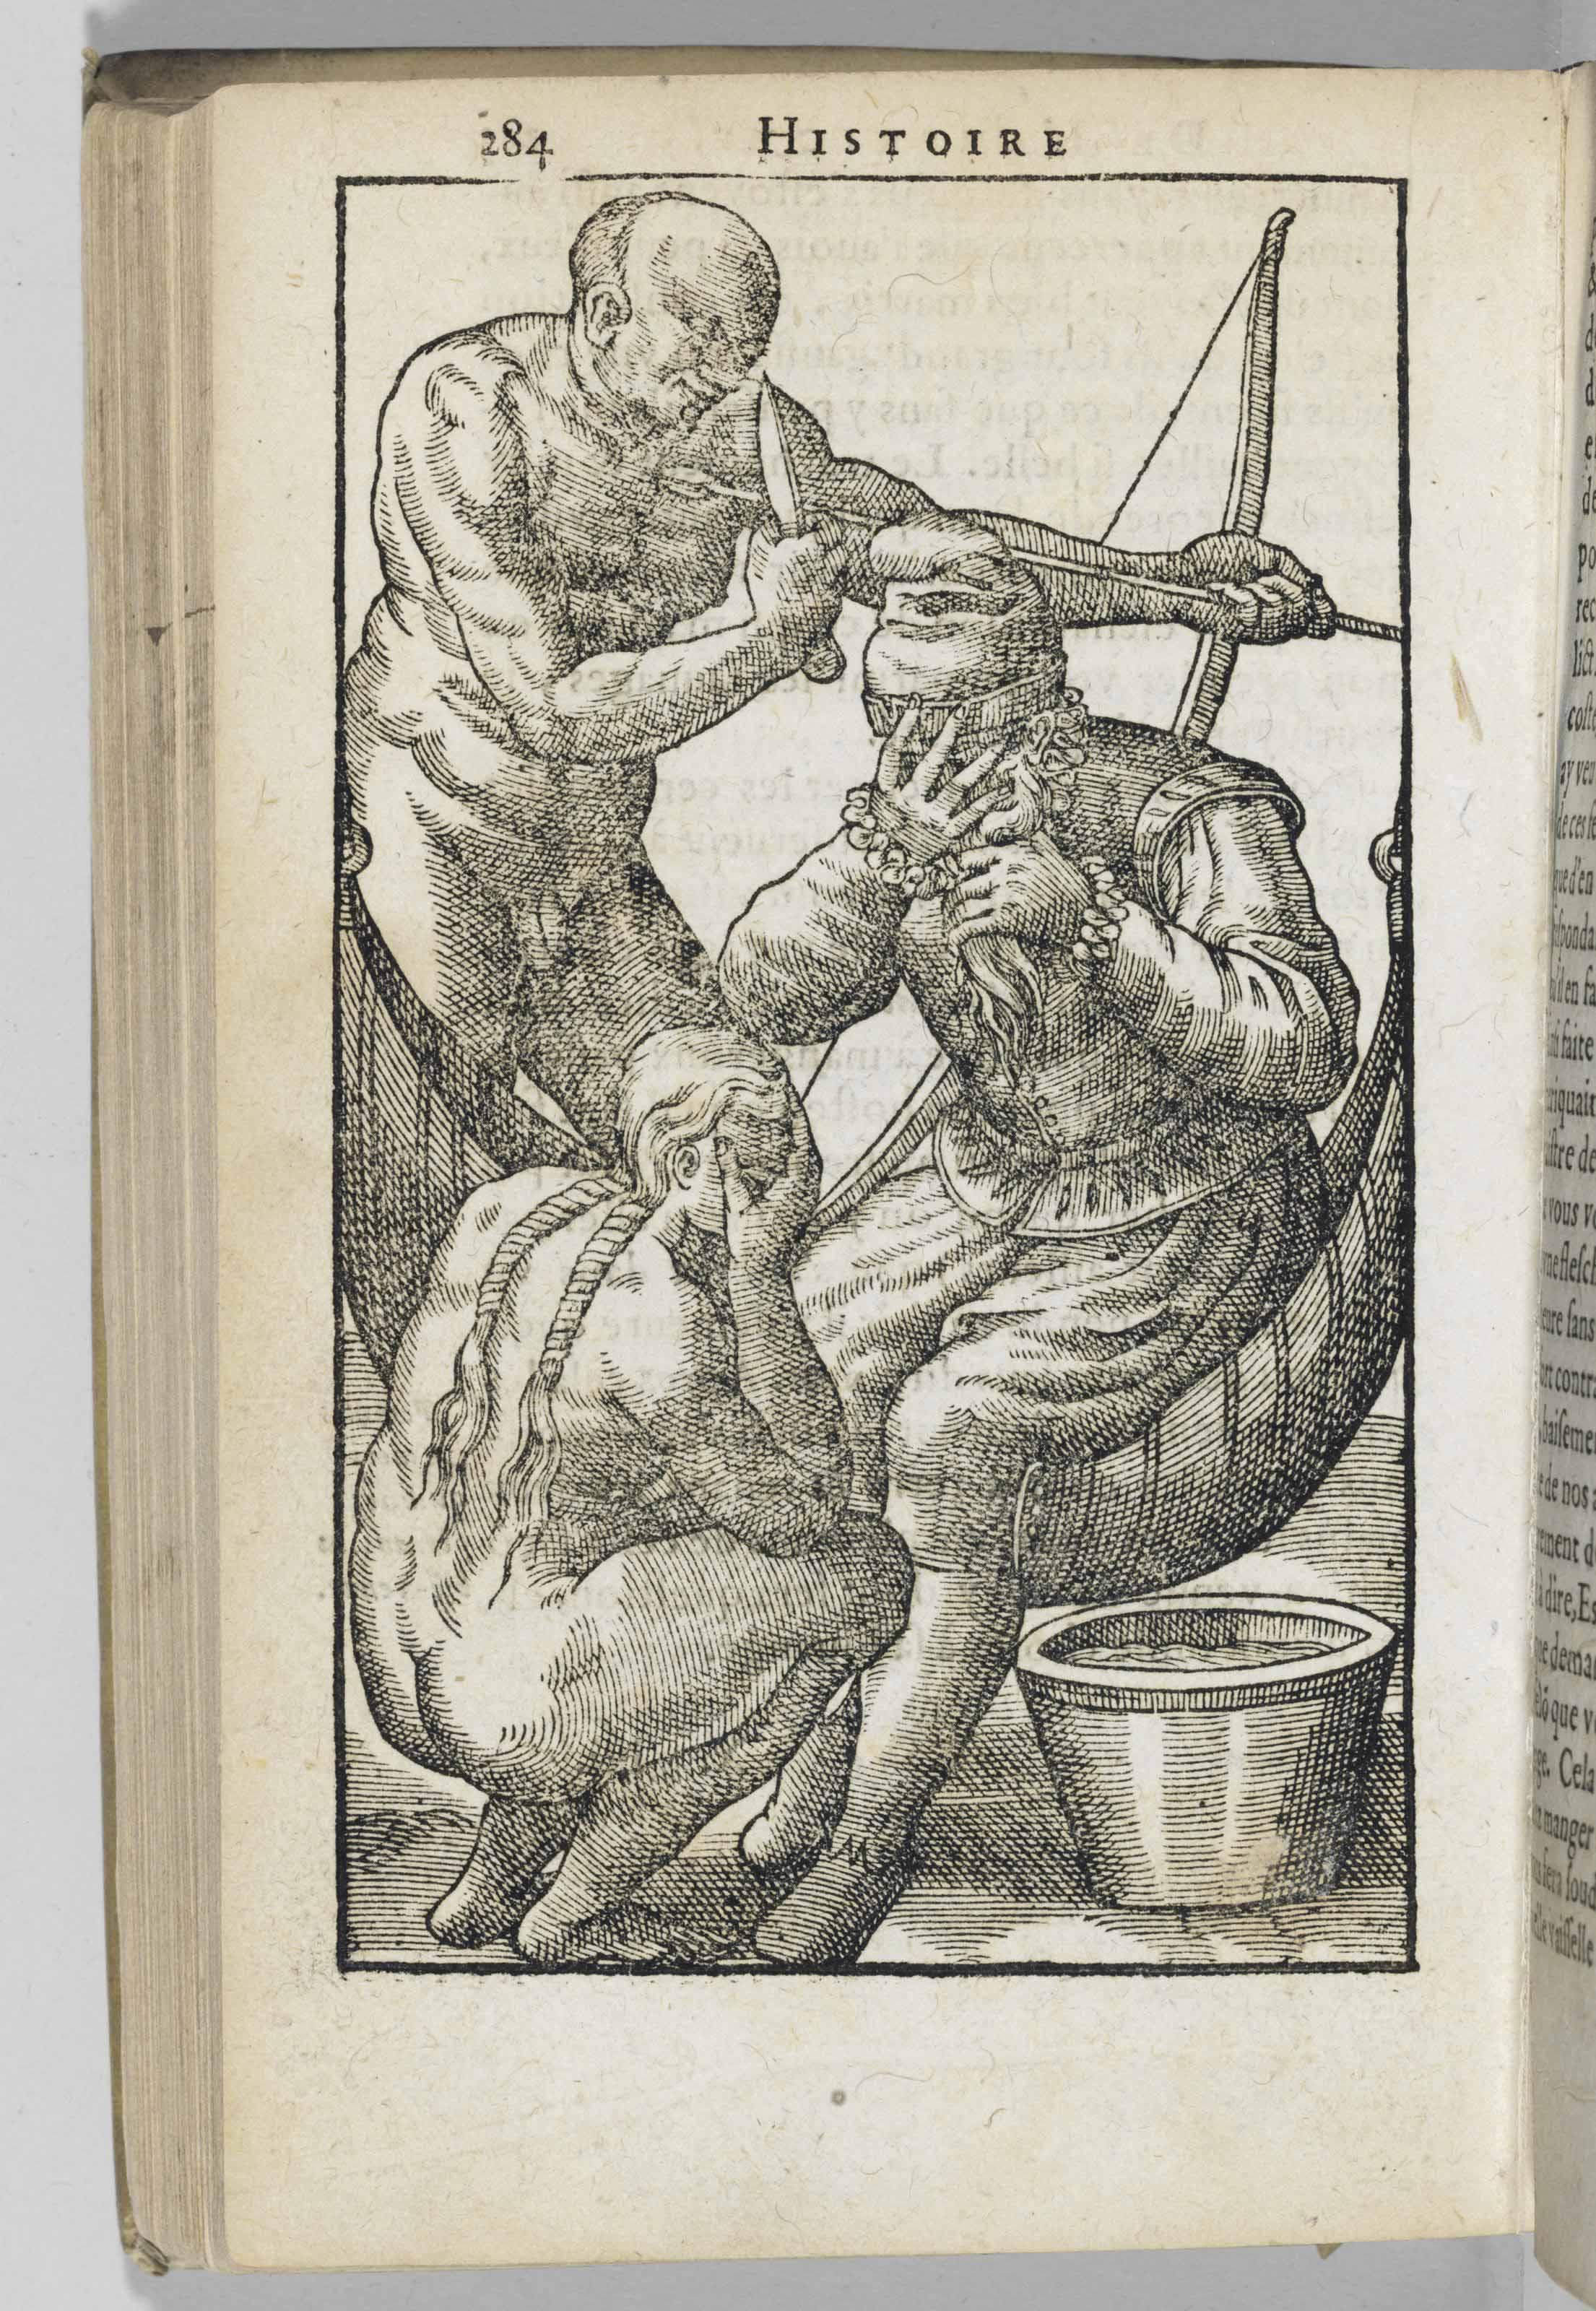 LÉRY, Jean de (1534-1611). His